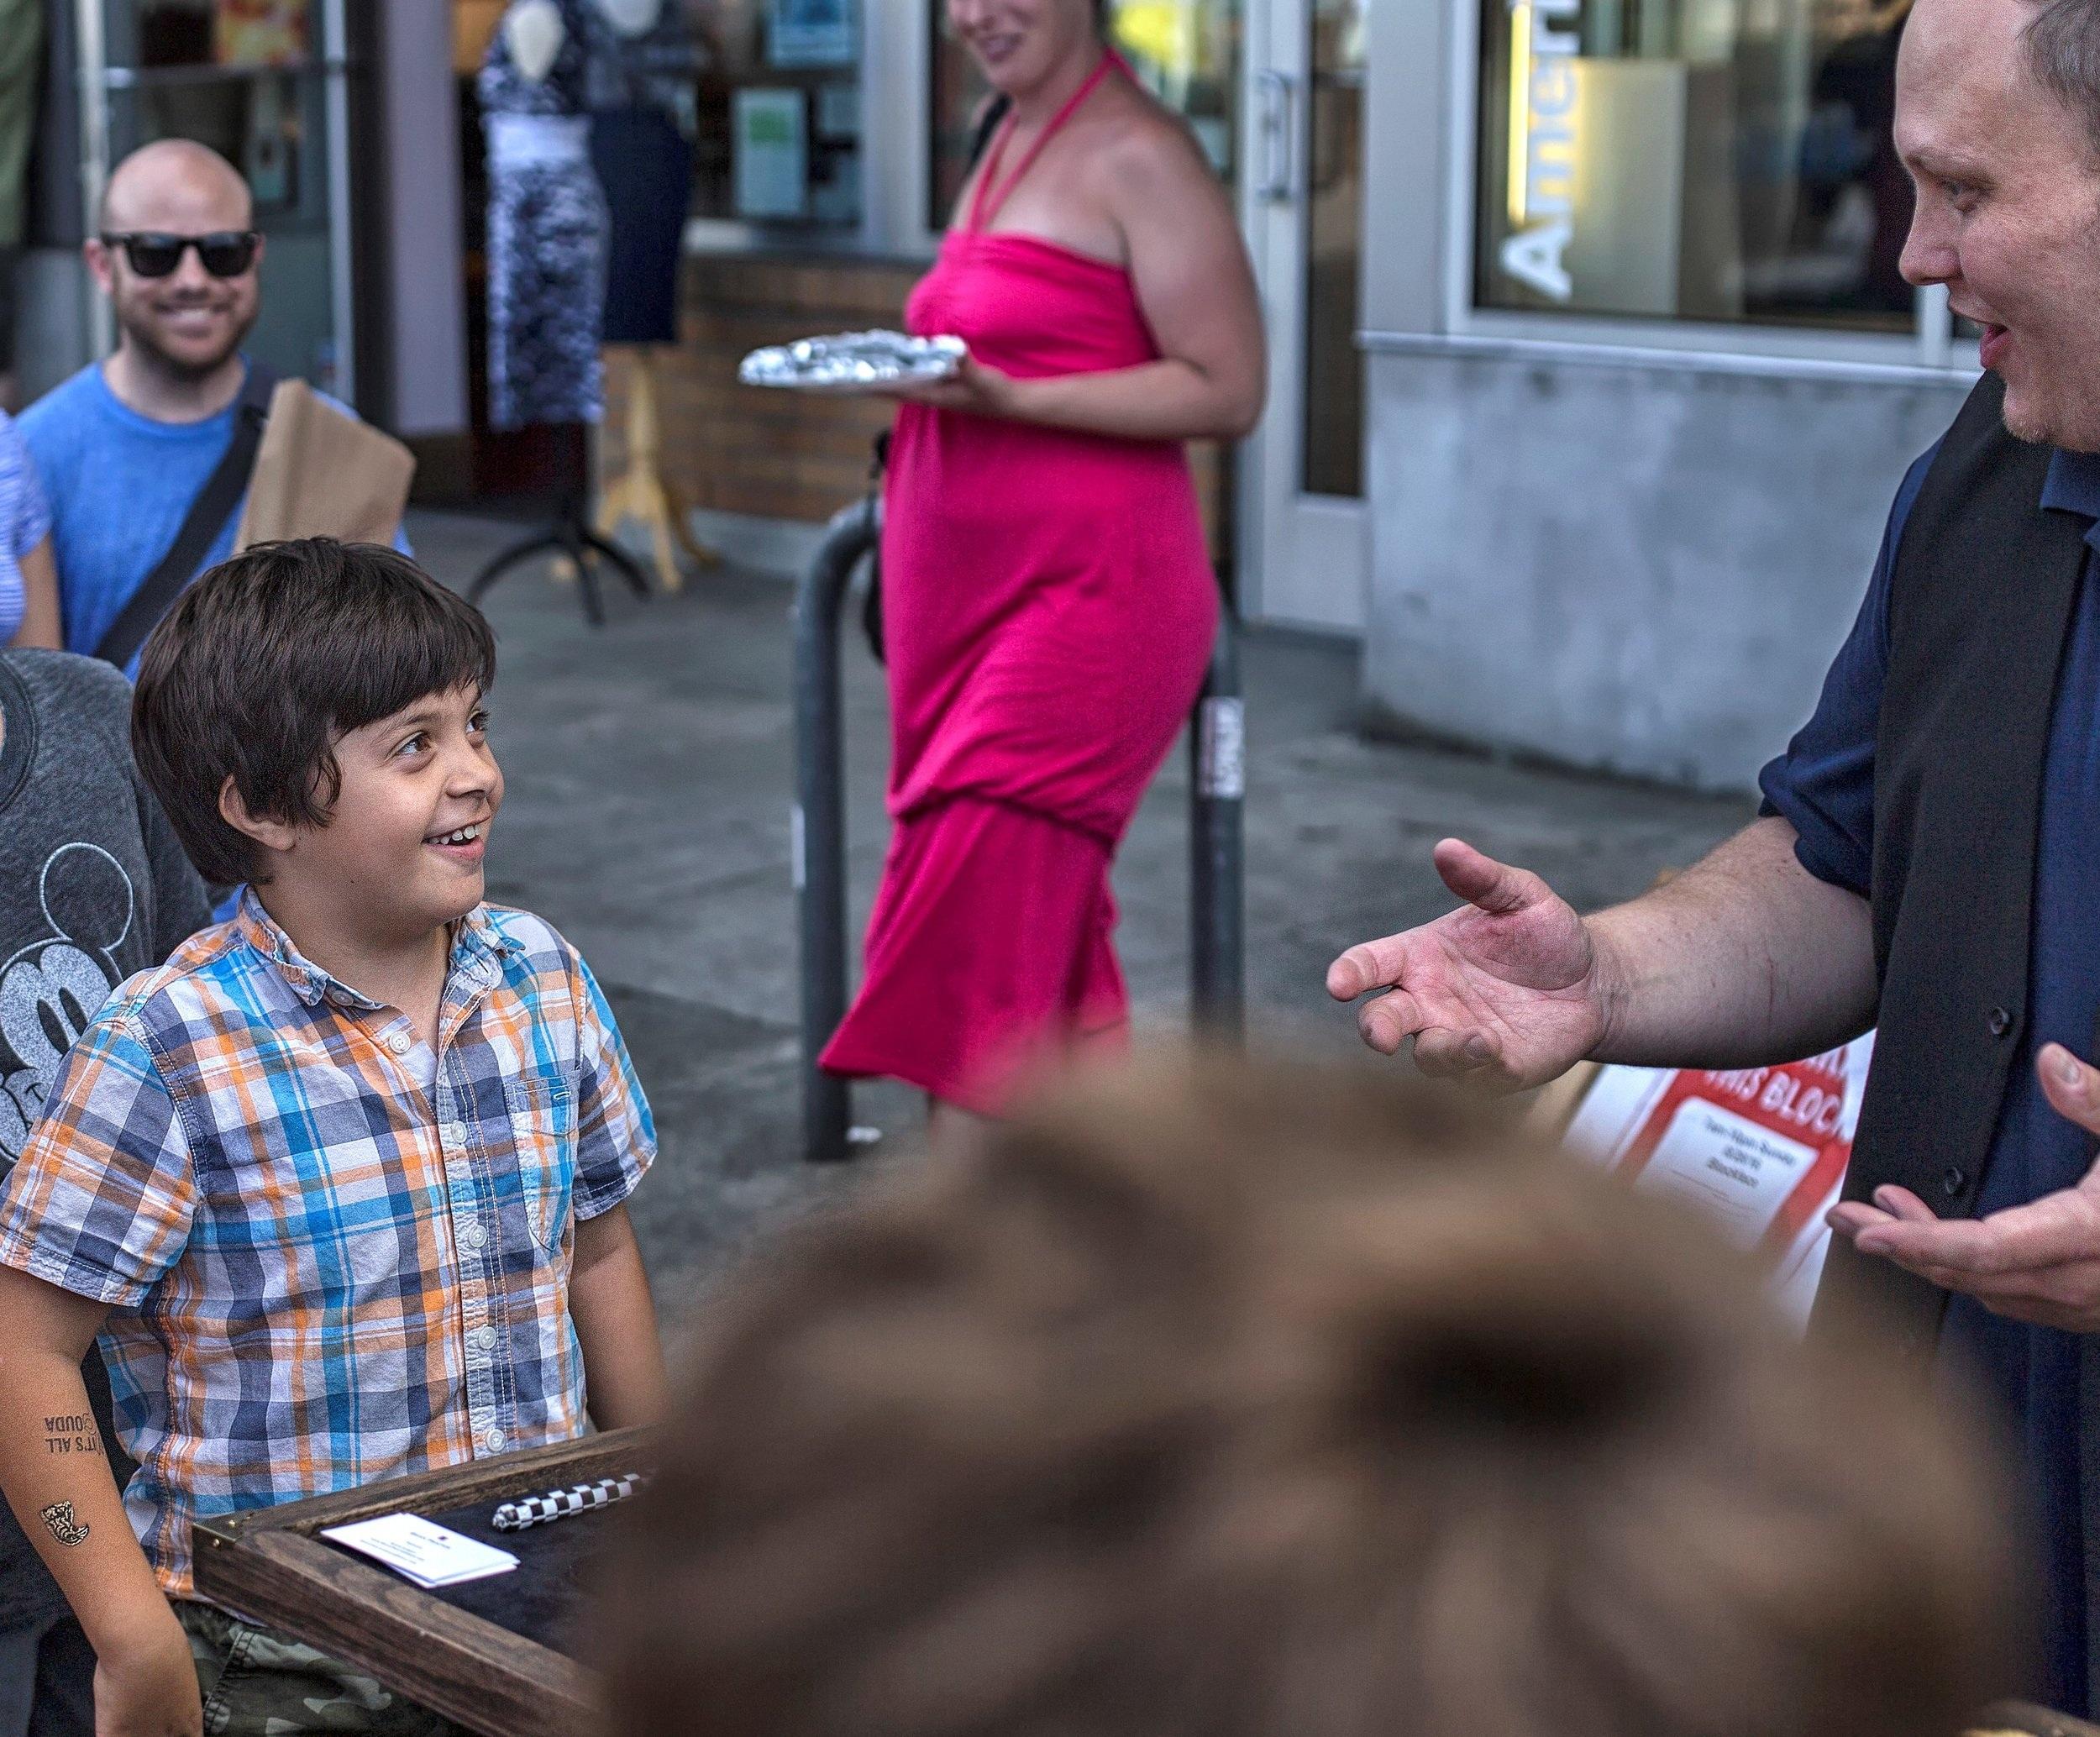 Brian Proctor amazes kids and parents alike (Photo by Darren Sethe 2018)